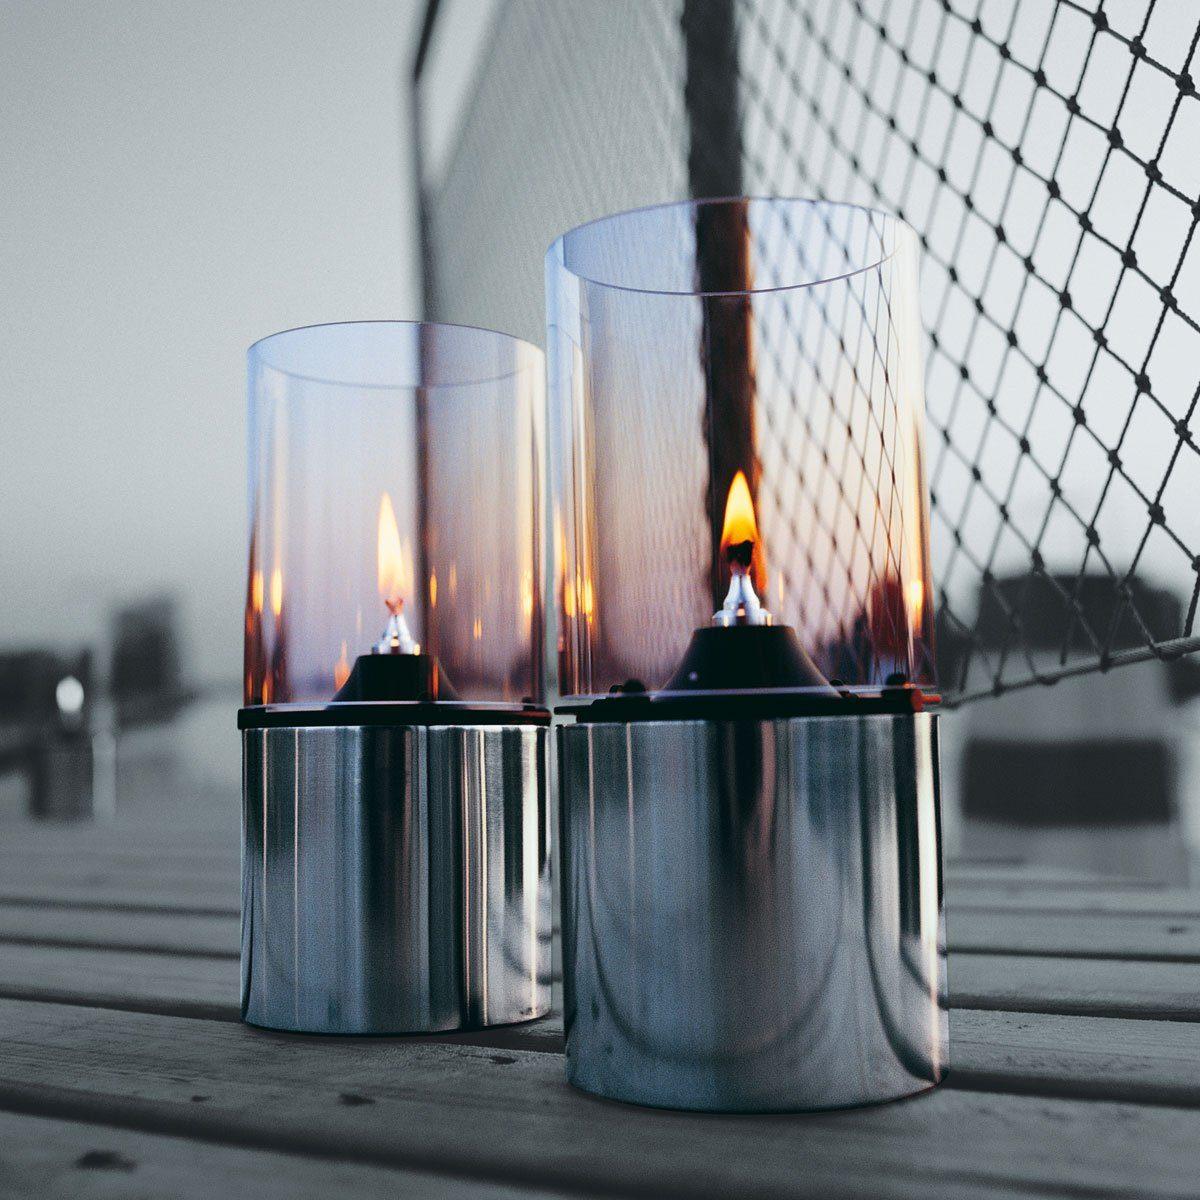 Stelton Stelton Öllampe mit Glasschirm klar 1005